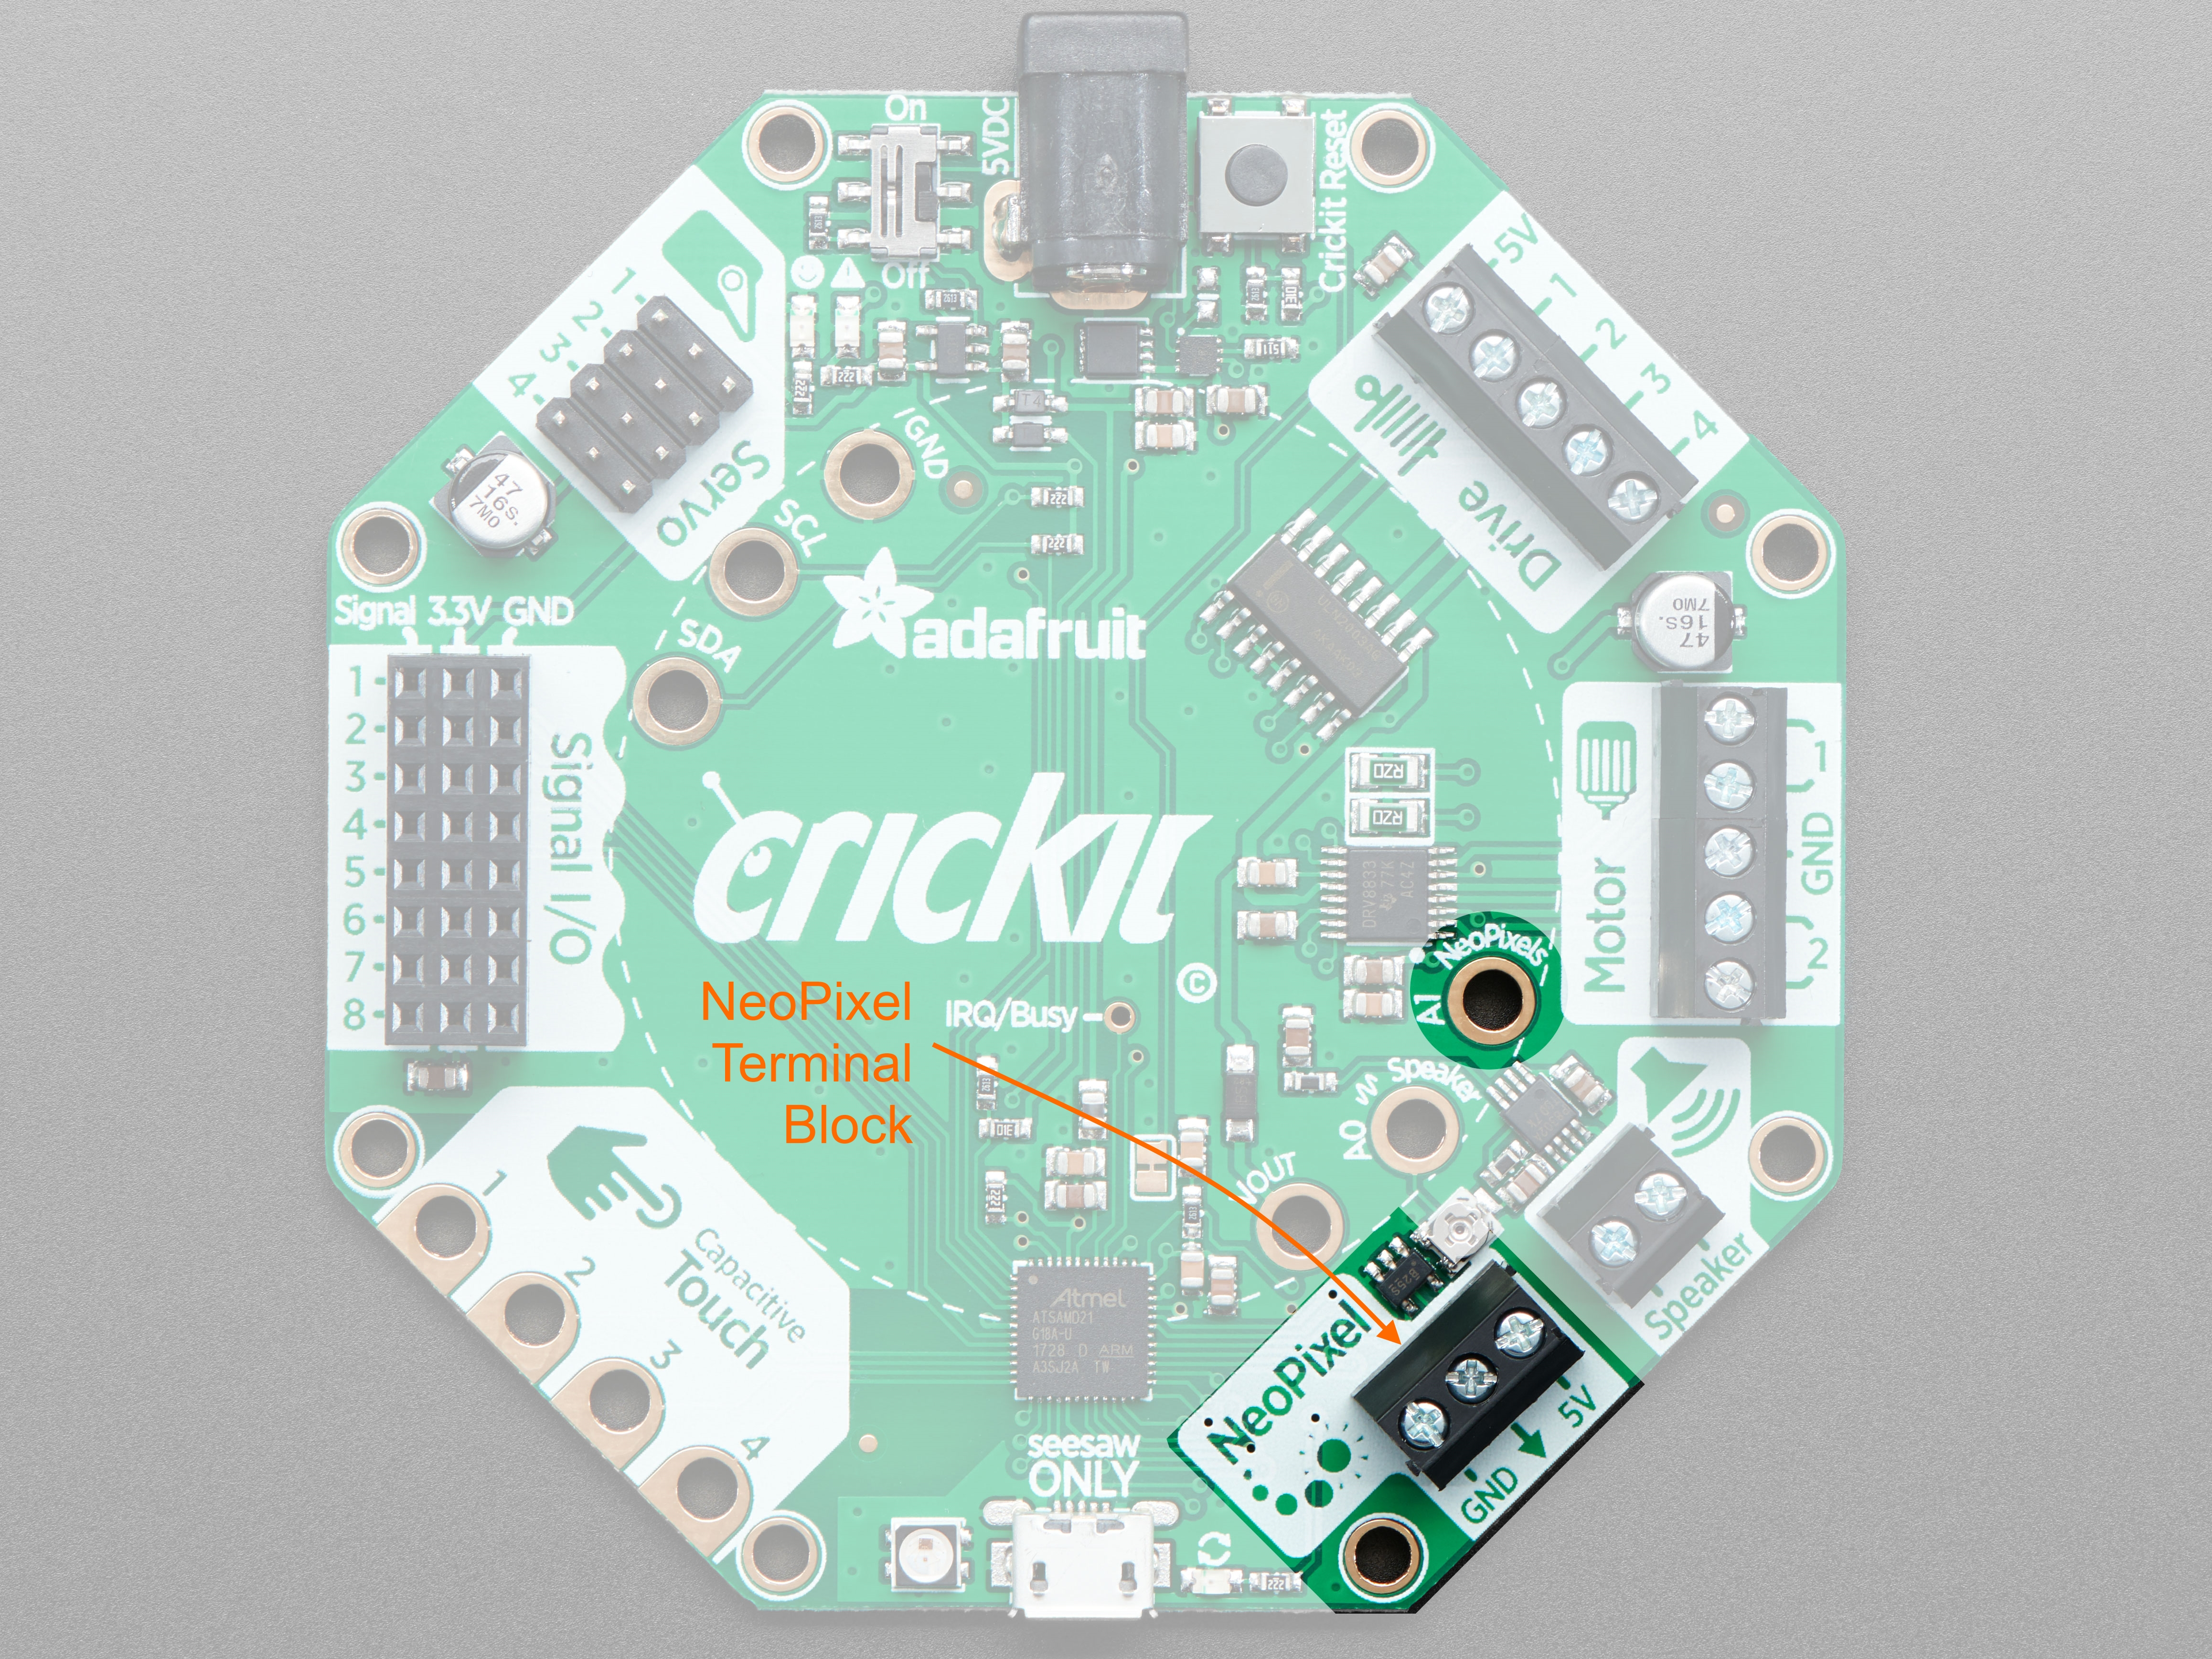 leds_circuit_playground_neopix_block.jpg